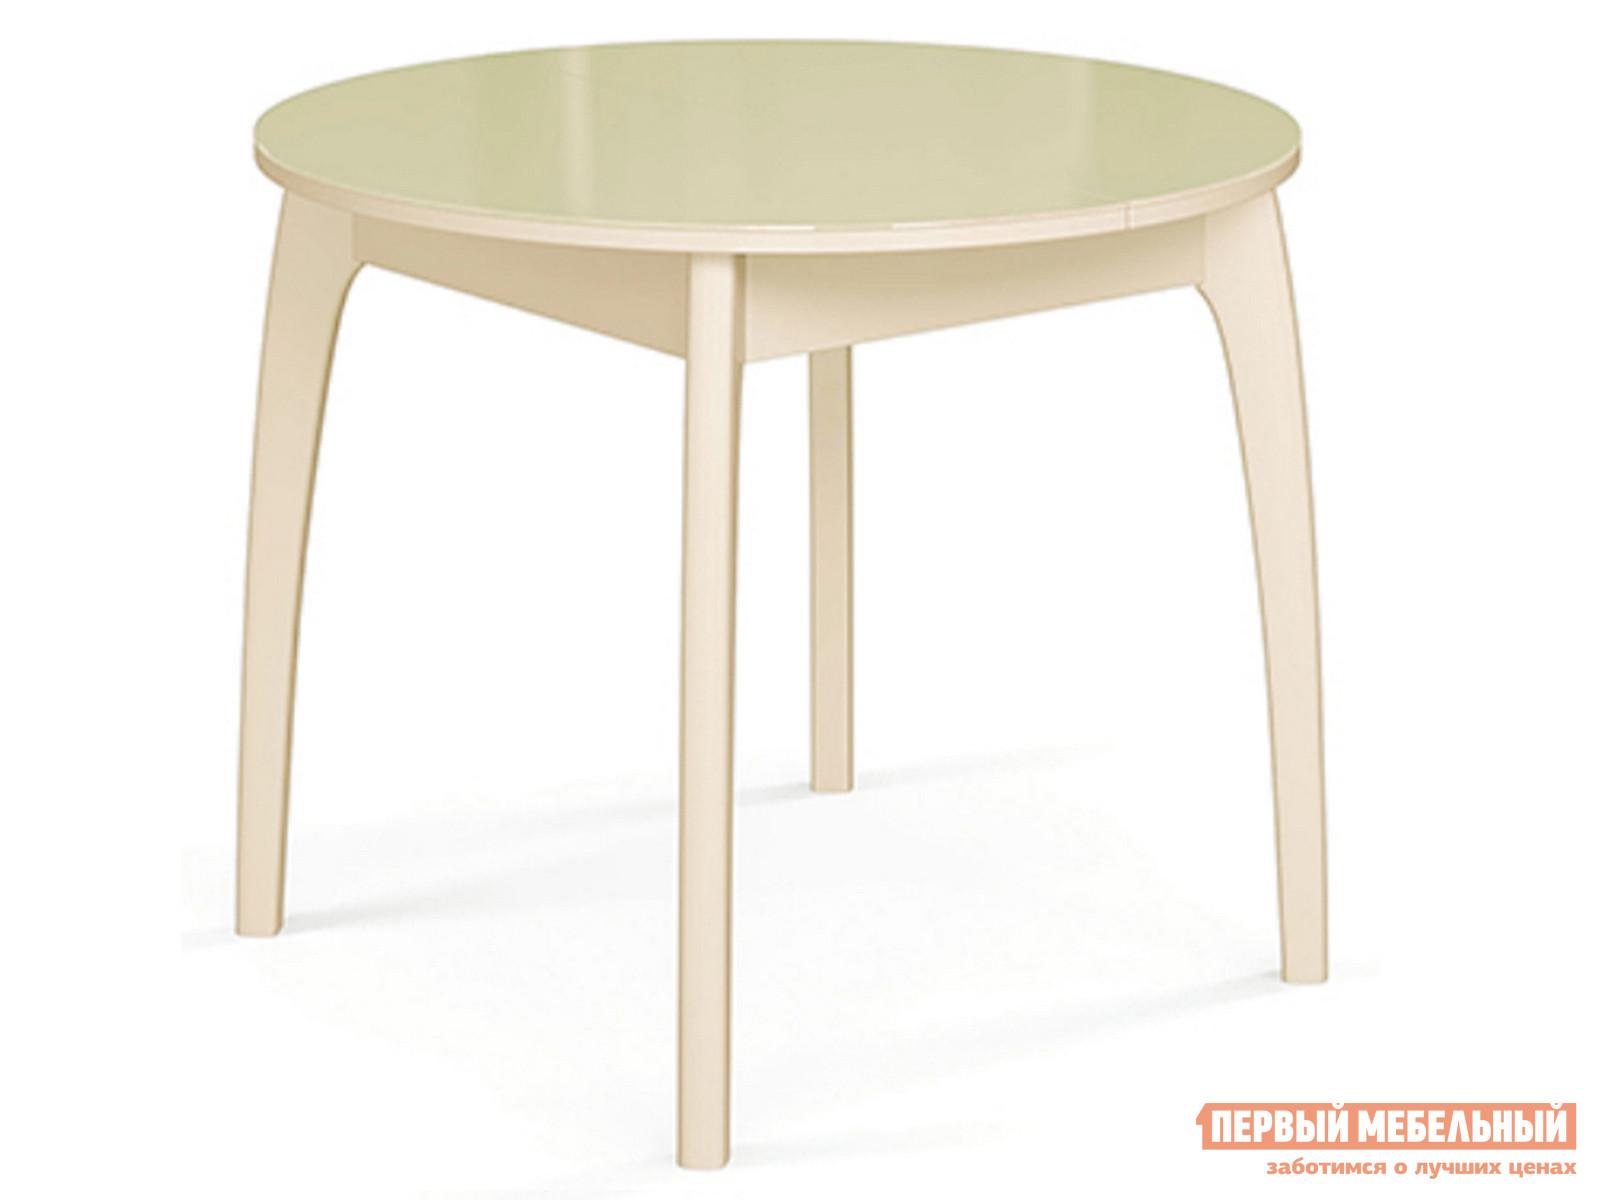 Кухонный стол ДИК Стол №46 ДН4 (круглый)